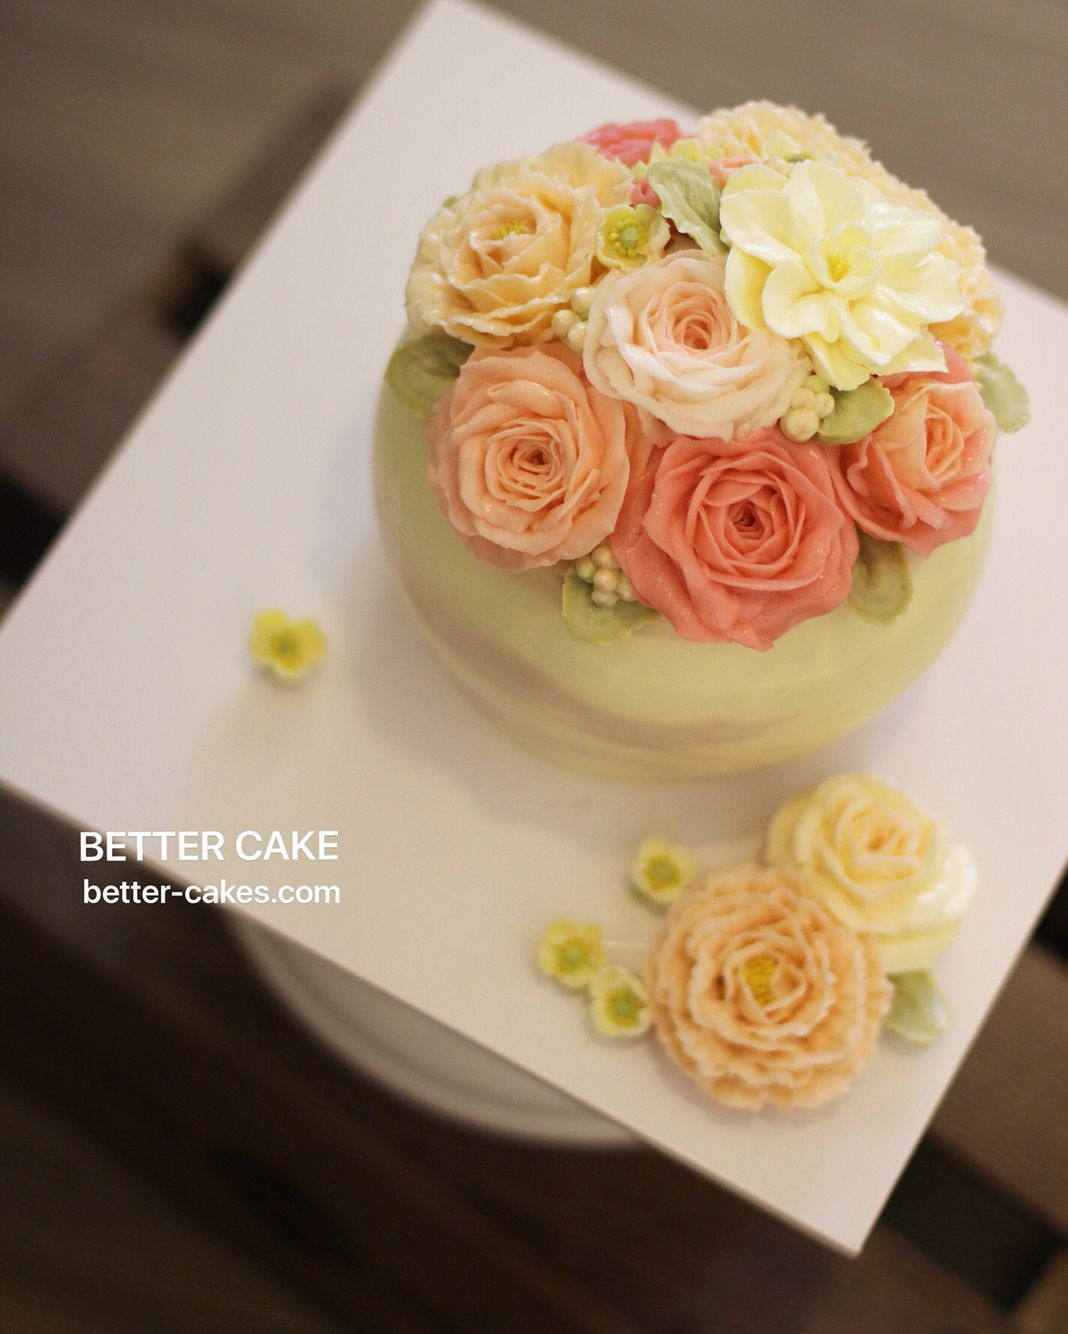 BETTER's new class, real style flower class. Student's work  . Any inquiries about my class, plz send me email bettercakes@naver.com  www.better-cakes.com #buttercream#cake#korea#baking#koreanbuttercream#bettercake#버터크림케이크#베러케익#yummy#flower#꽃#sweet#플라워케이크클래스#foodporn#Taipei#Taiwan#디저트#foodie#dessert#버터크림플라워케익#follow#food#koreancake#beautiful#flowerstagram#instacake#like#꽃스타그램#koreastyle#instafood#